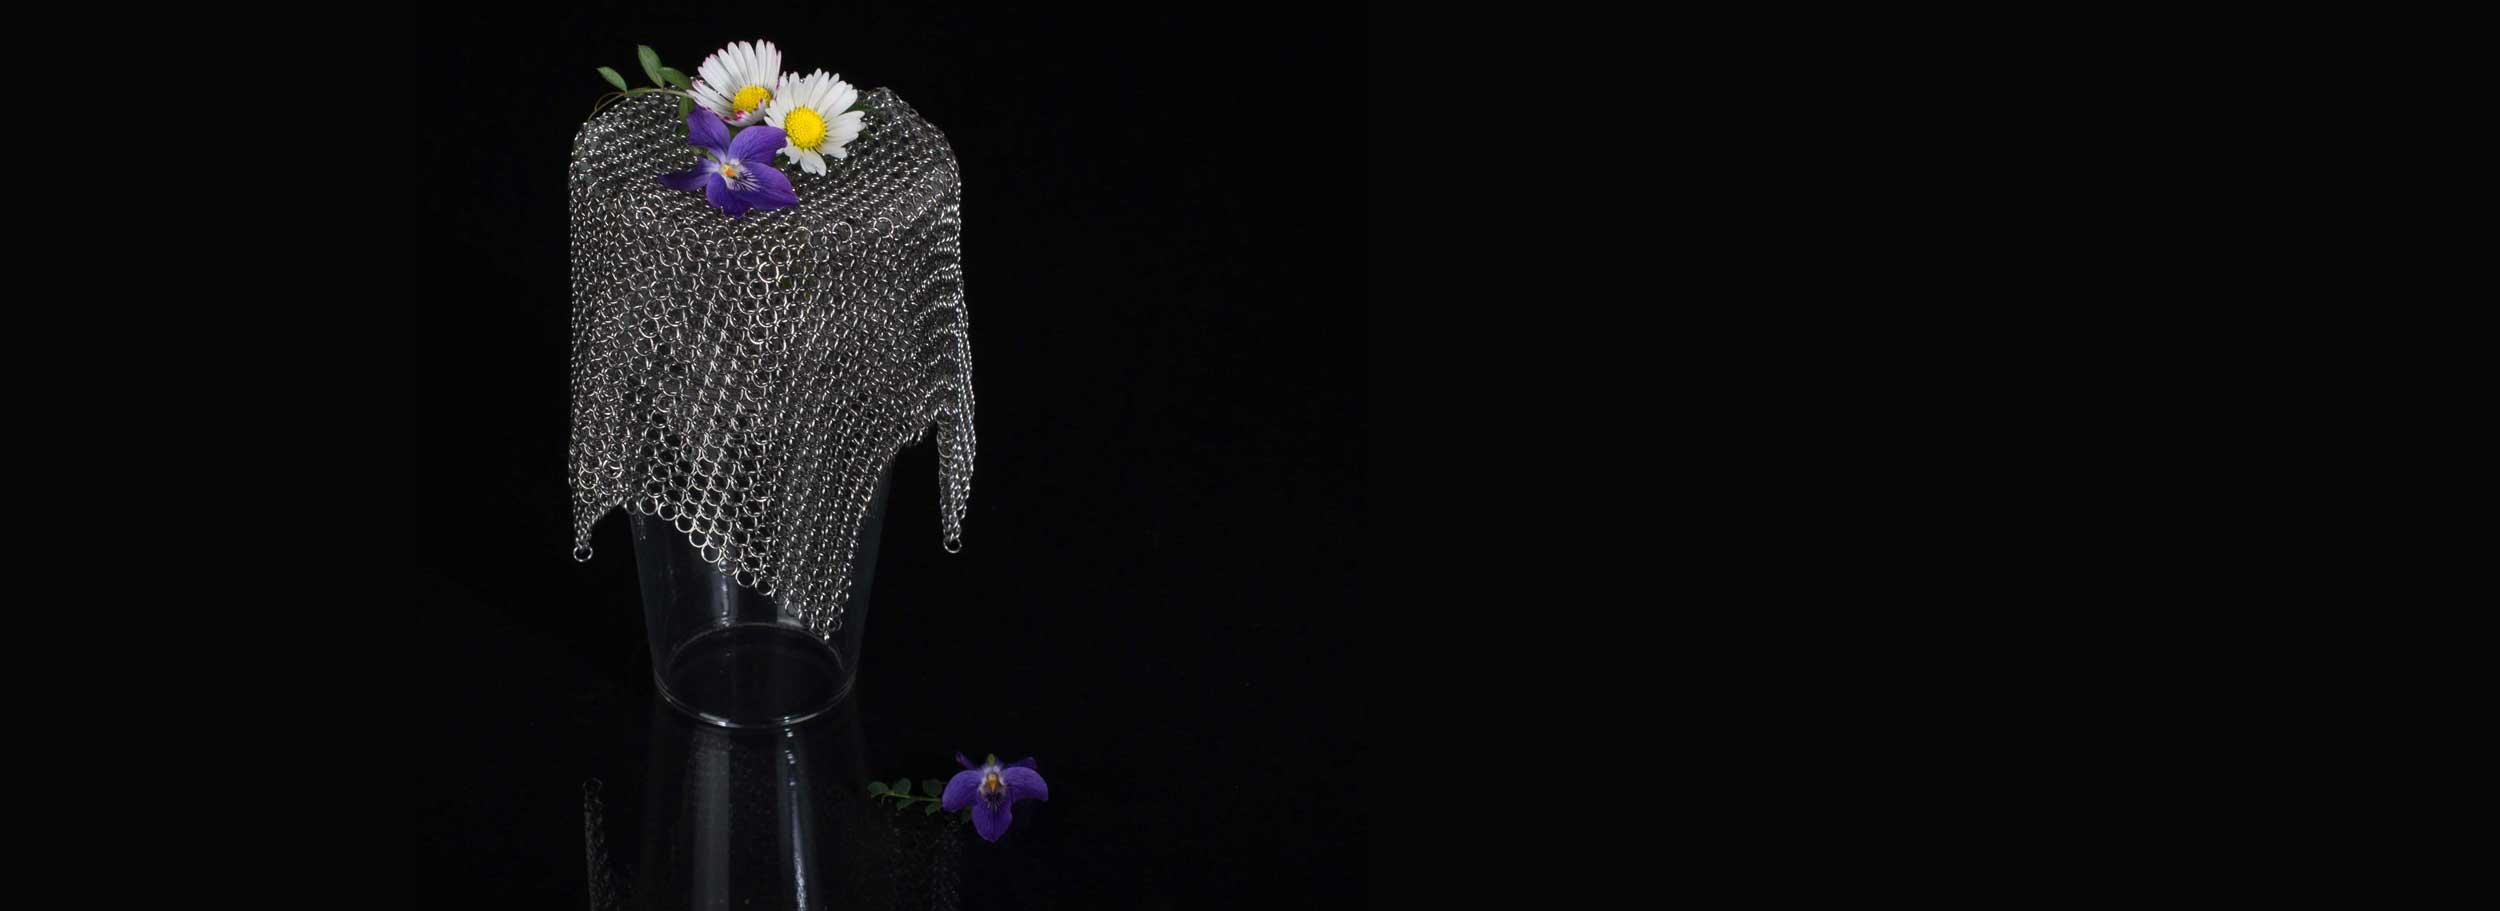 Petite-coupelle-fleure1